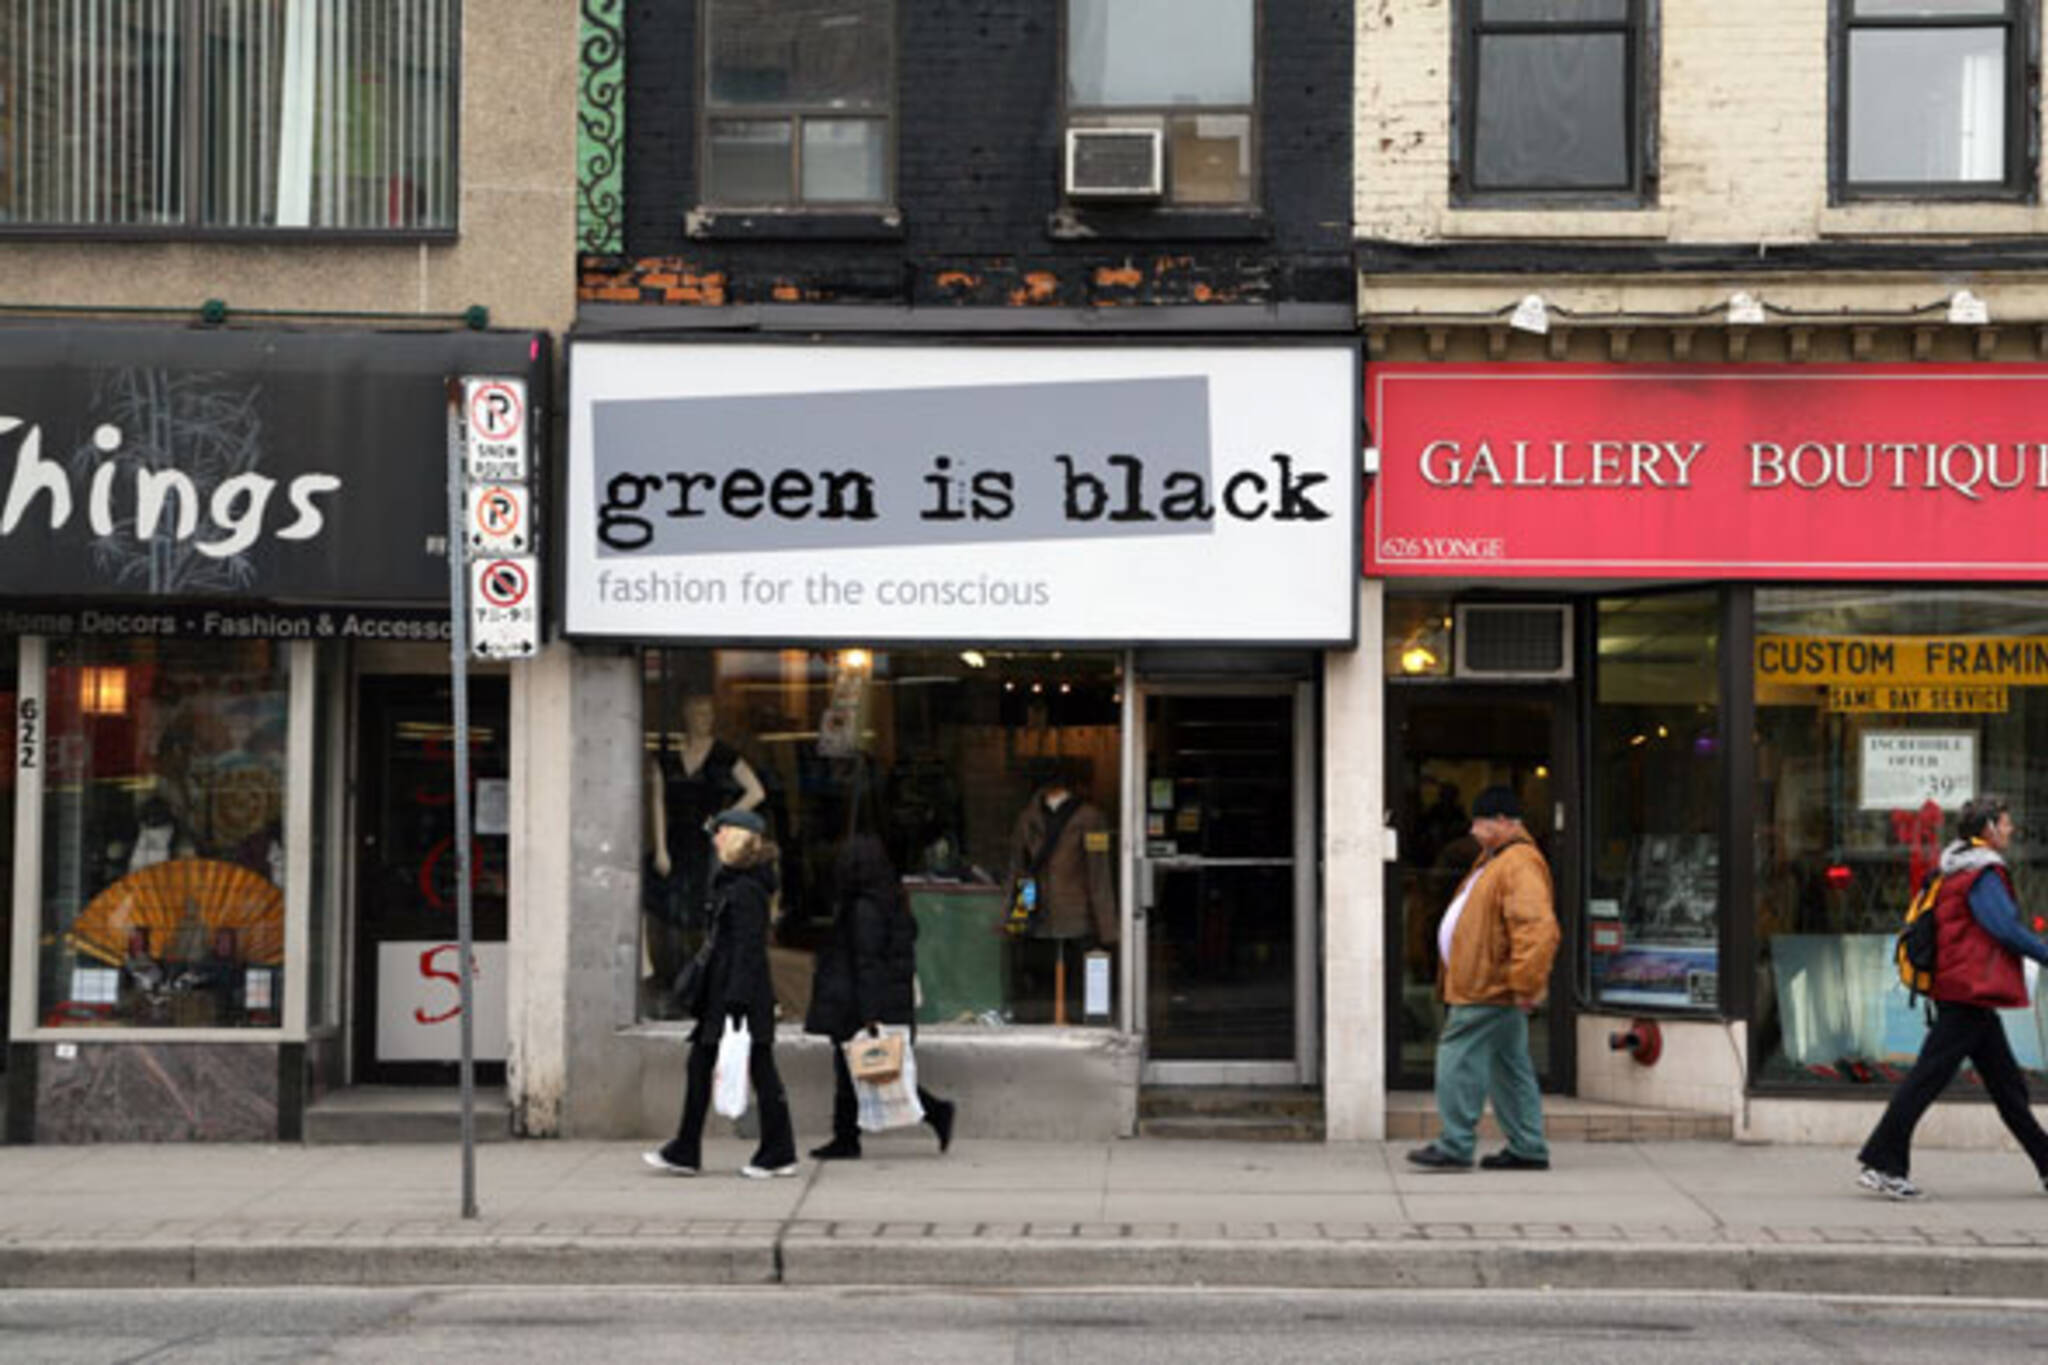 Green is Black